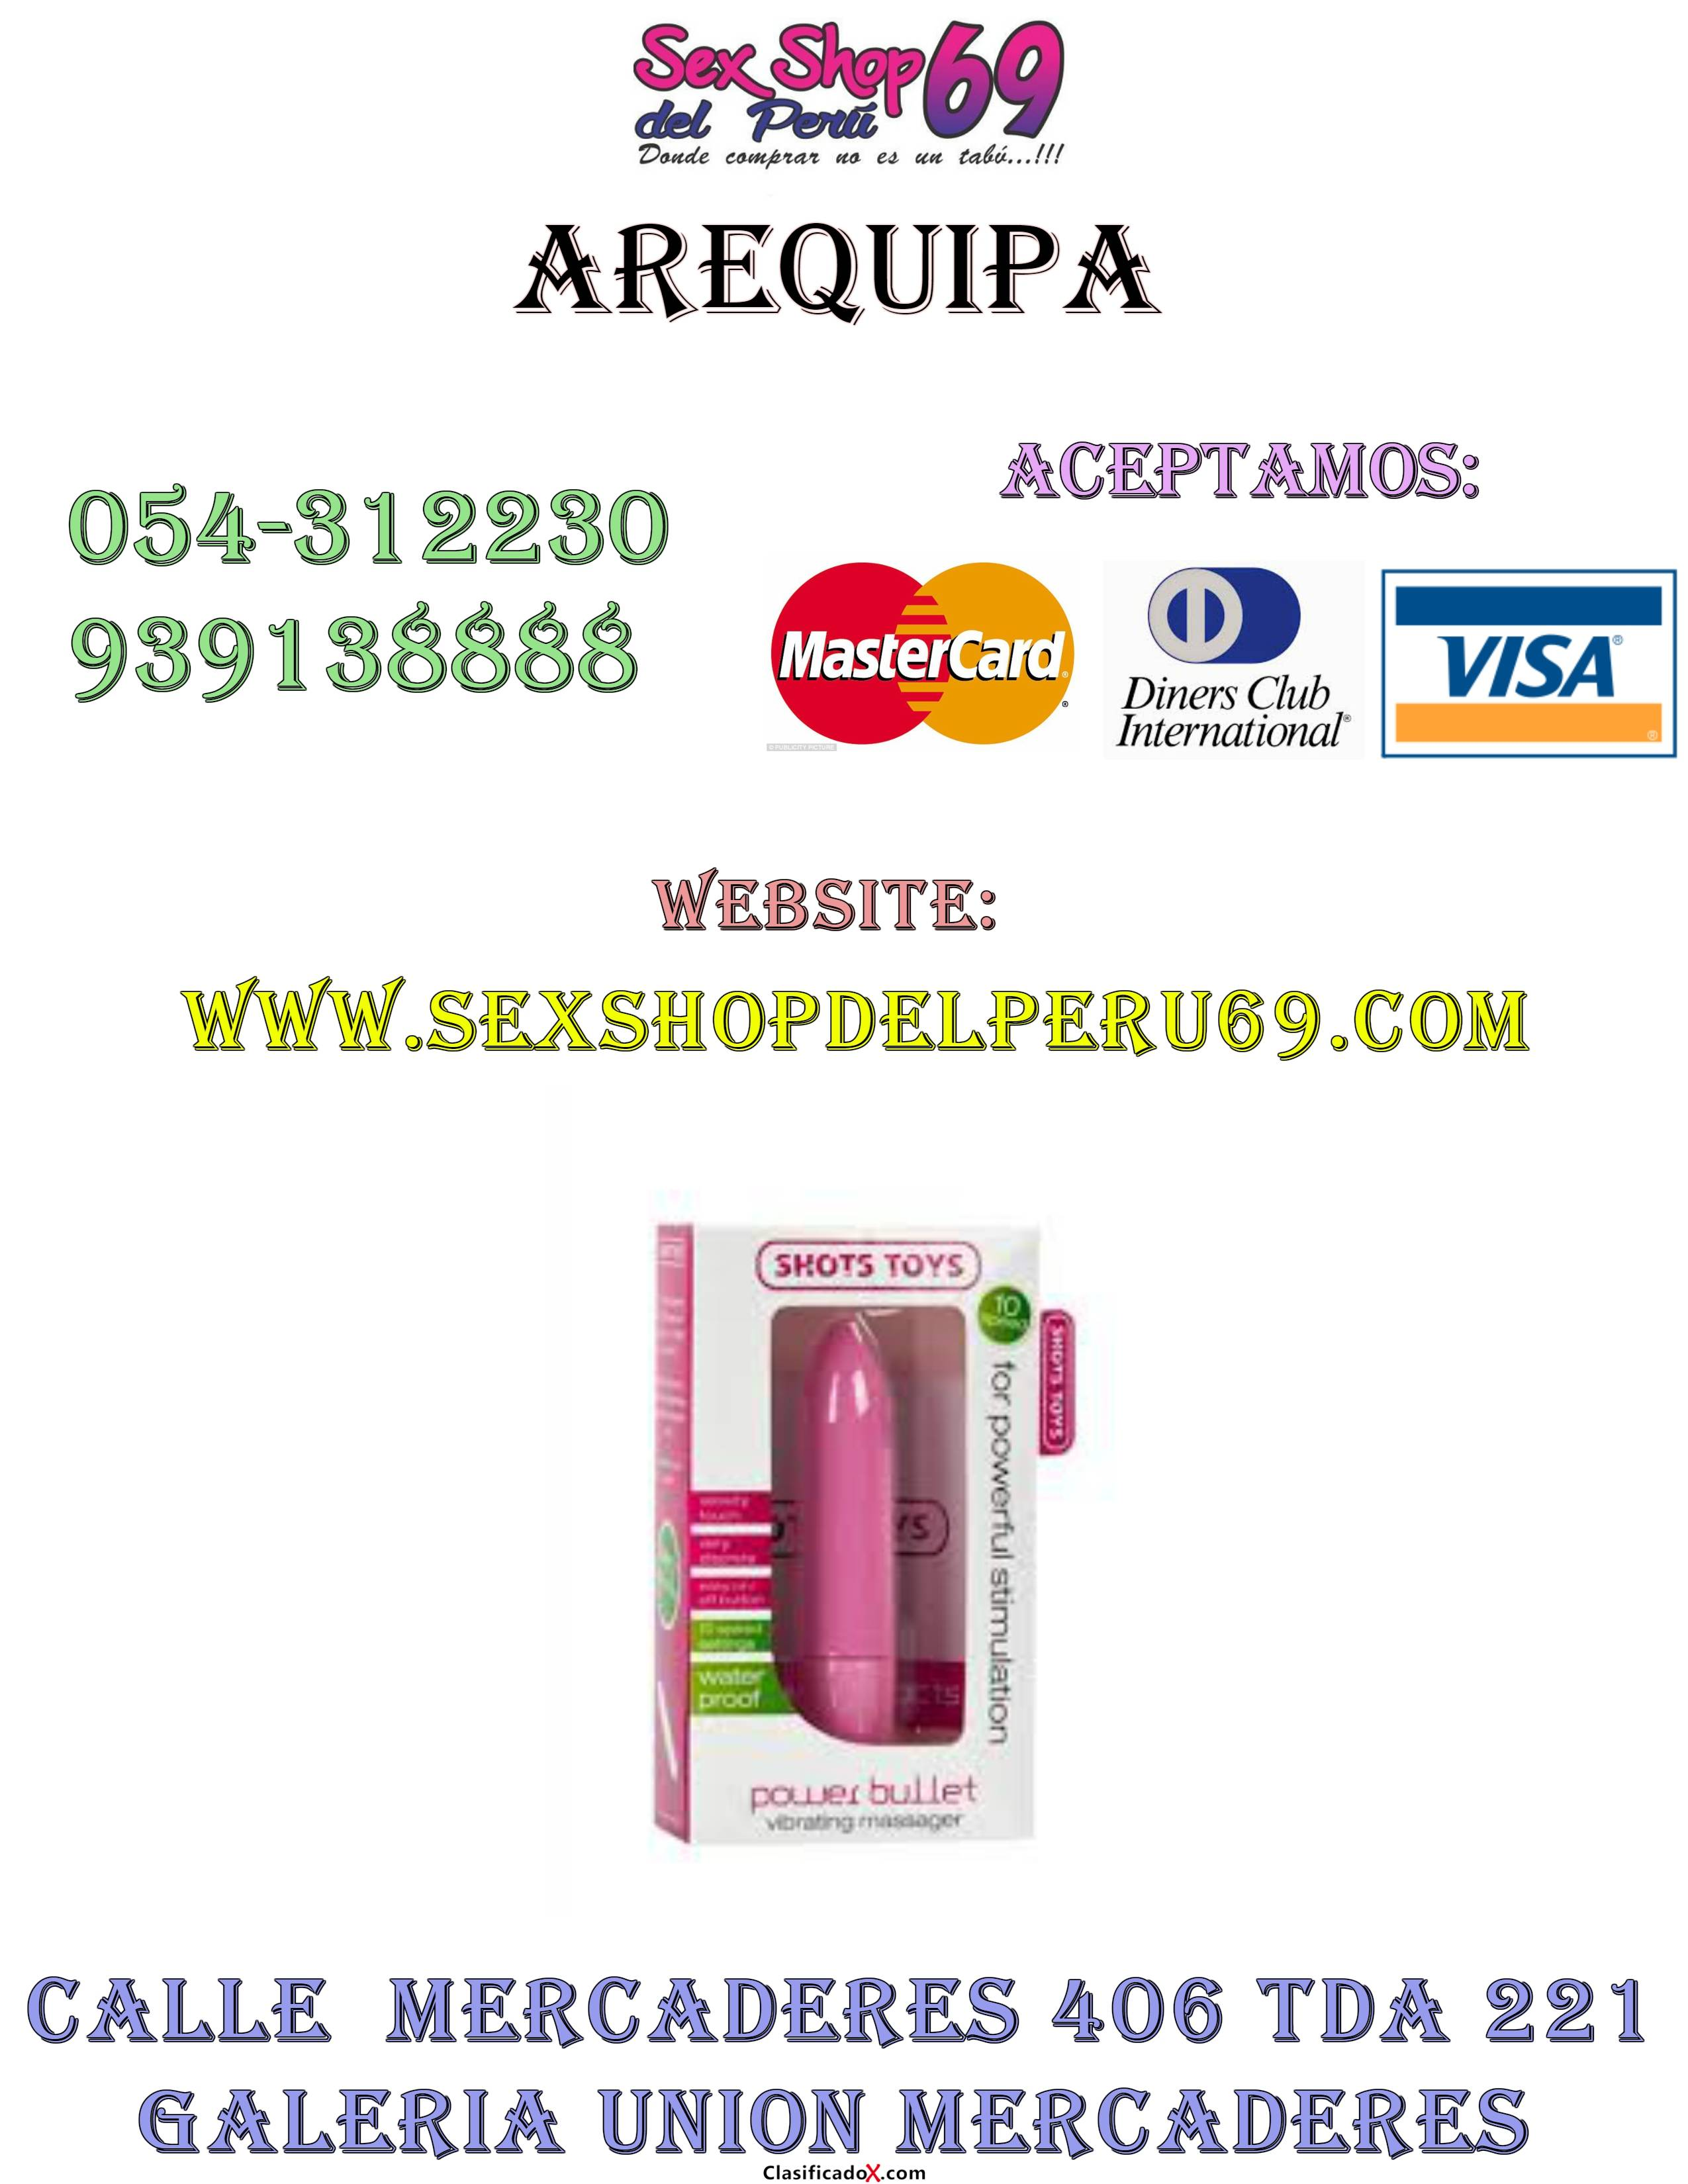 sexshop arequipa  telf..:054-312230